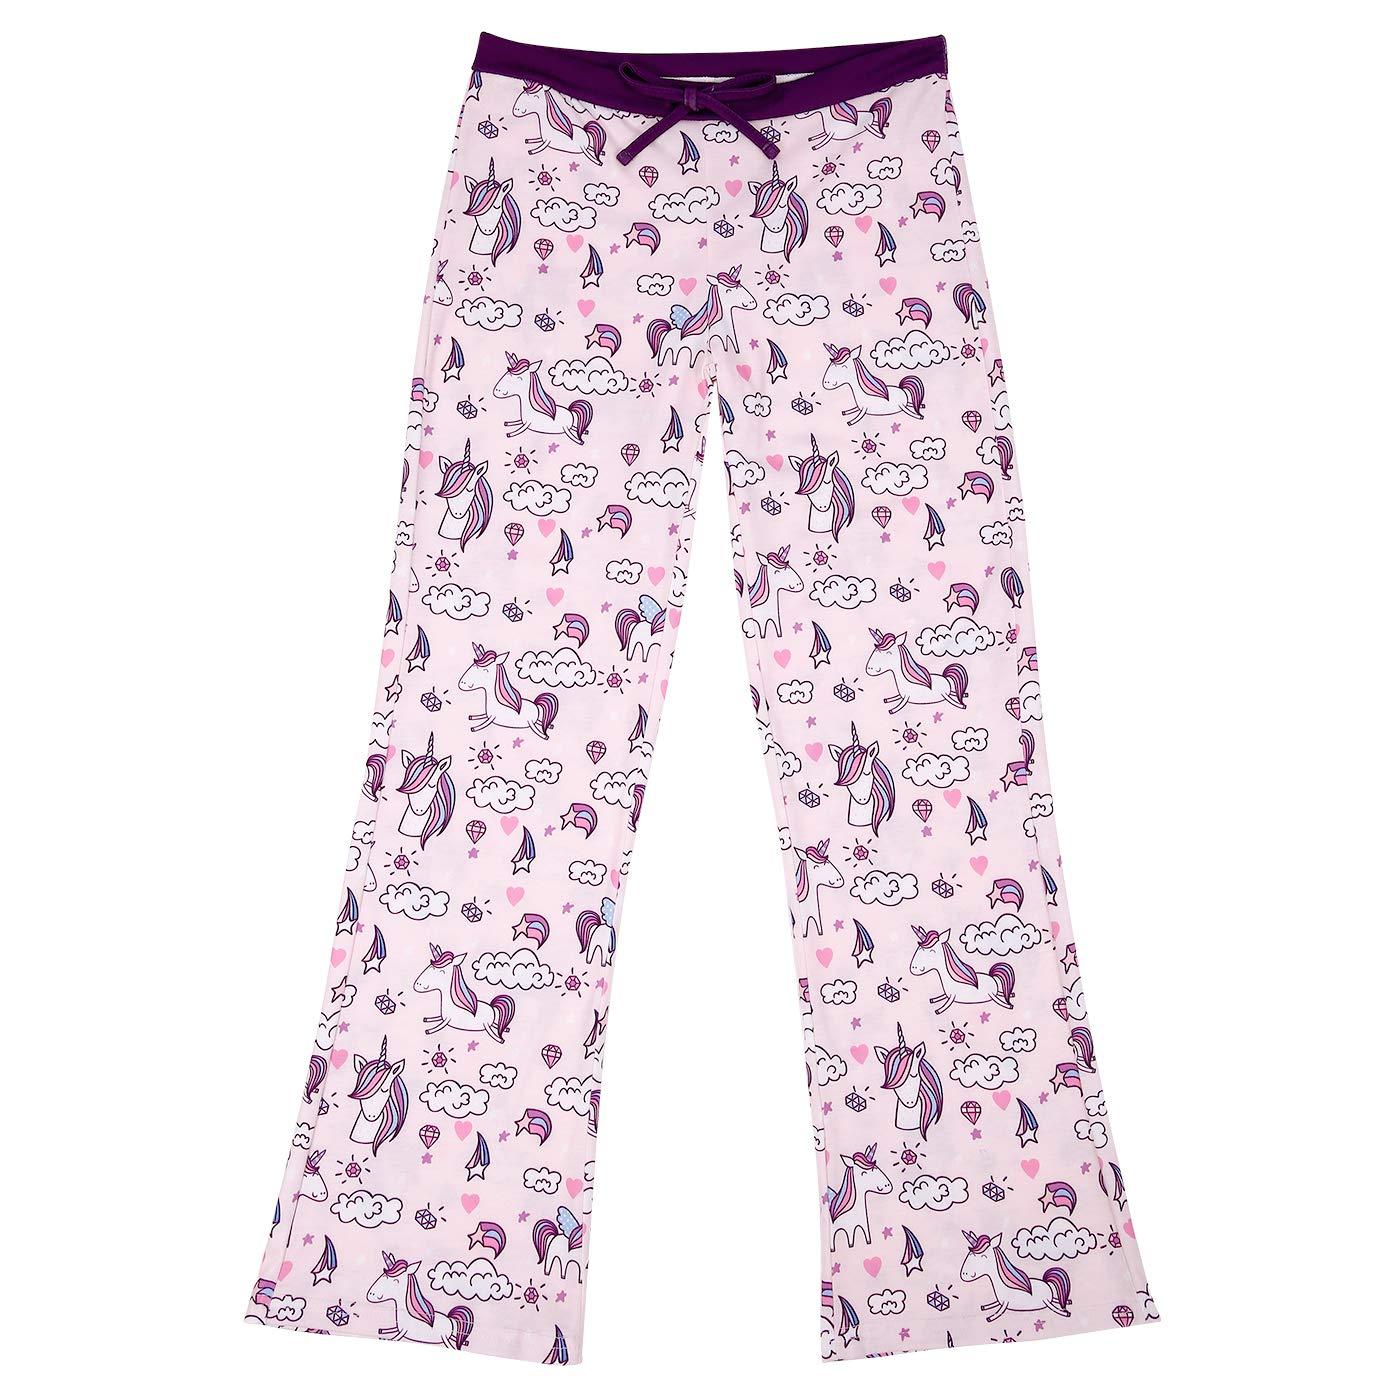 HDE Girl's Pajama Pants Soft Sleepwear Casual Loose Lounge PJ Bottoms